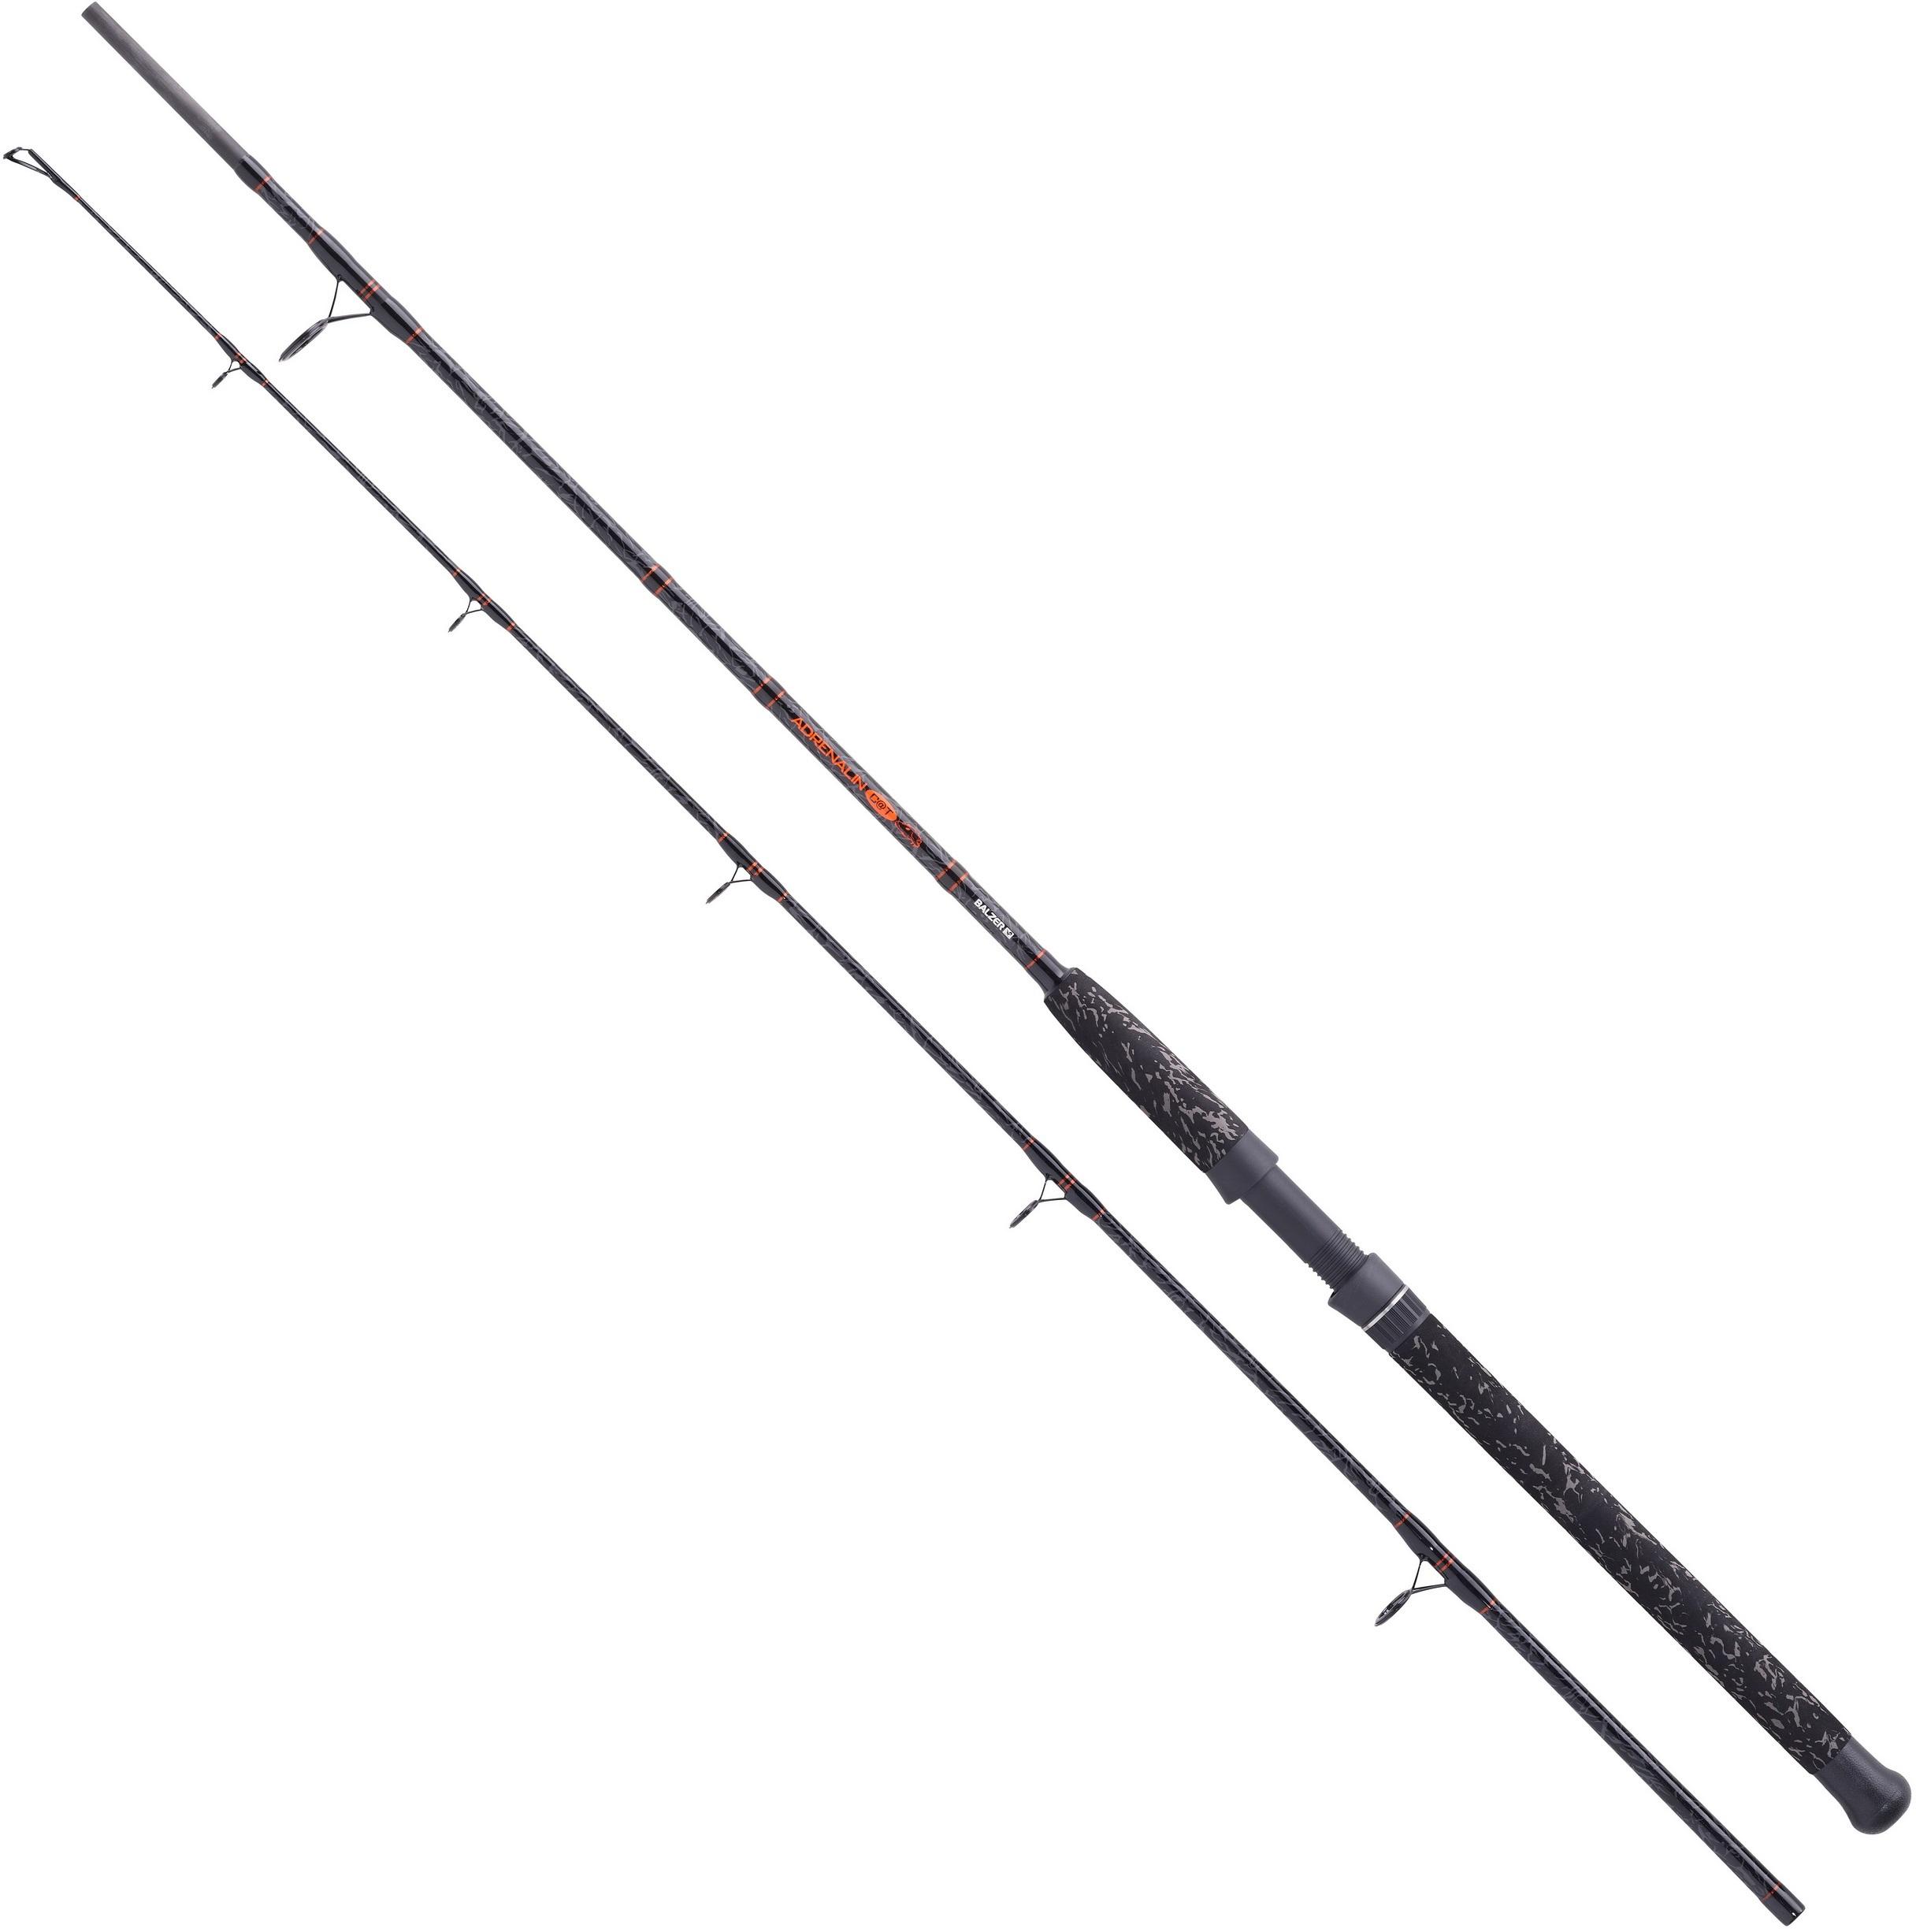 Удилище для ловли сома Balzer Adrenalin Cat Slimer 2.45м 150-450гр